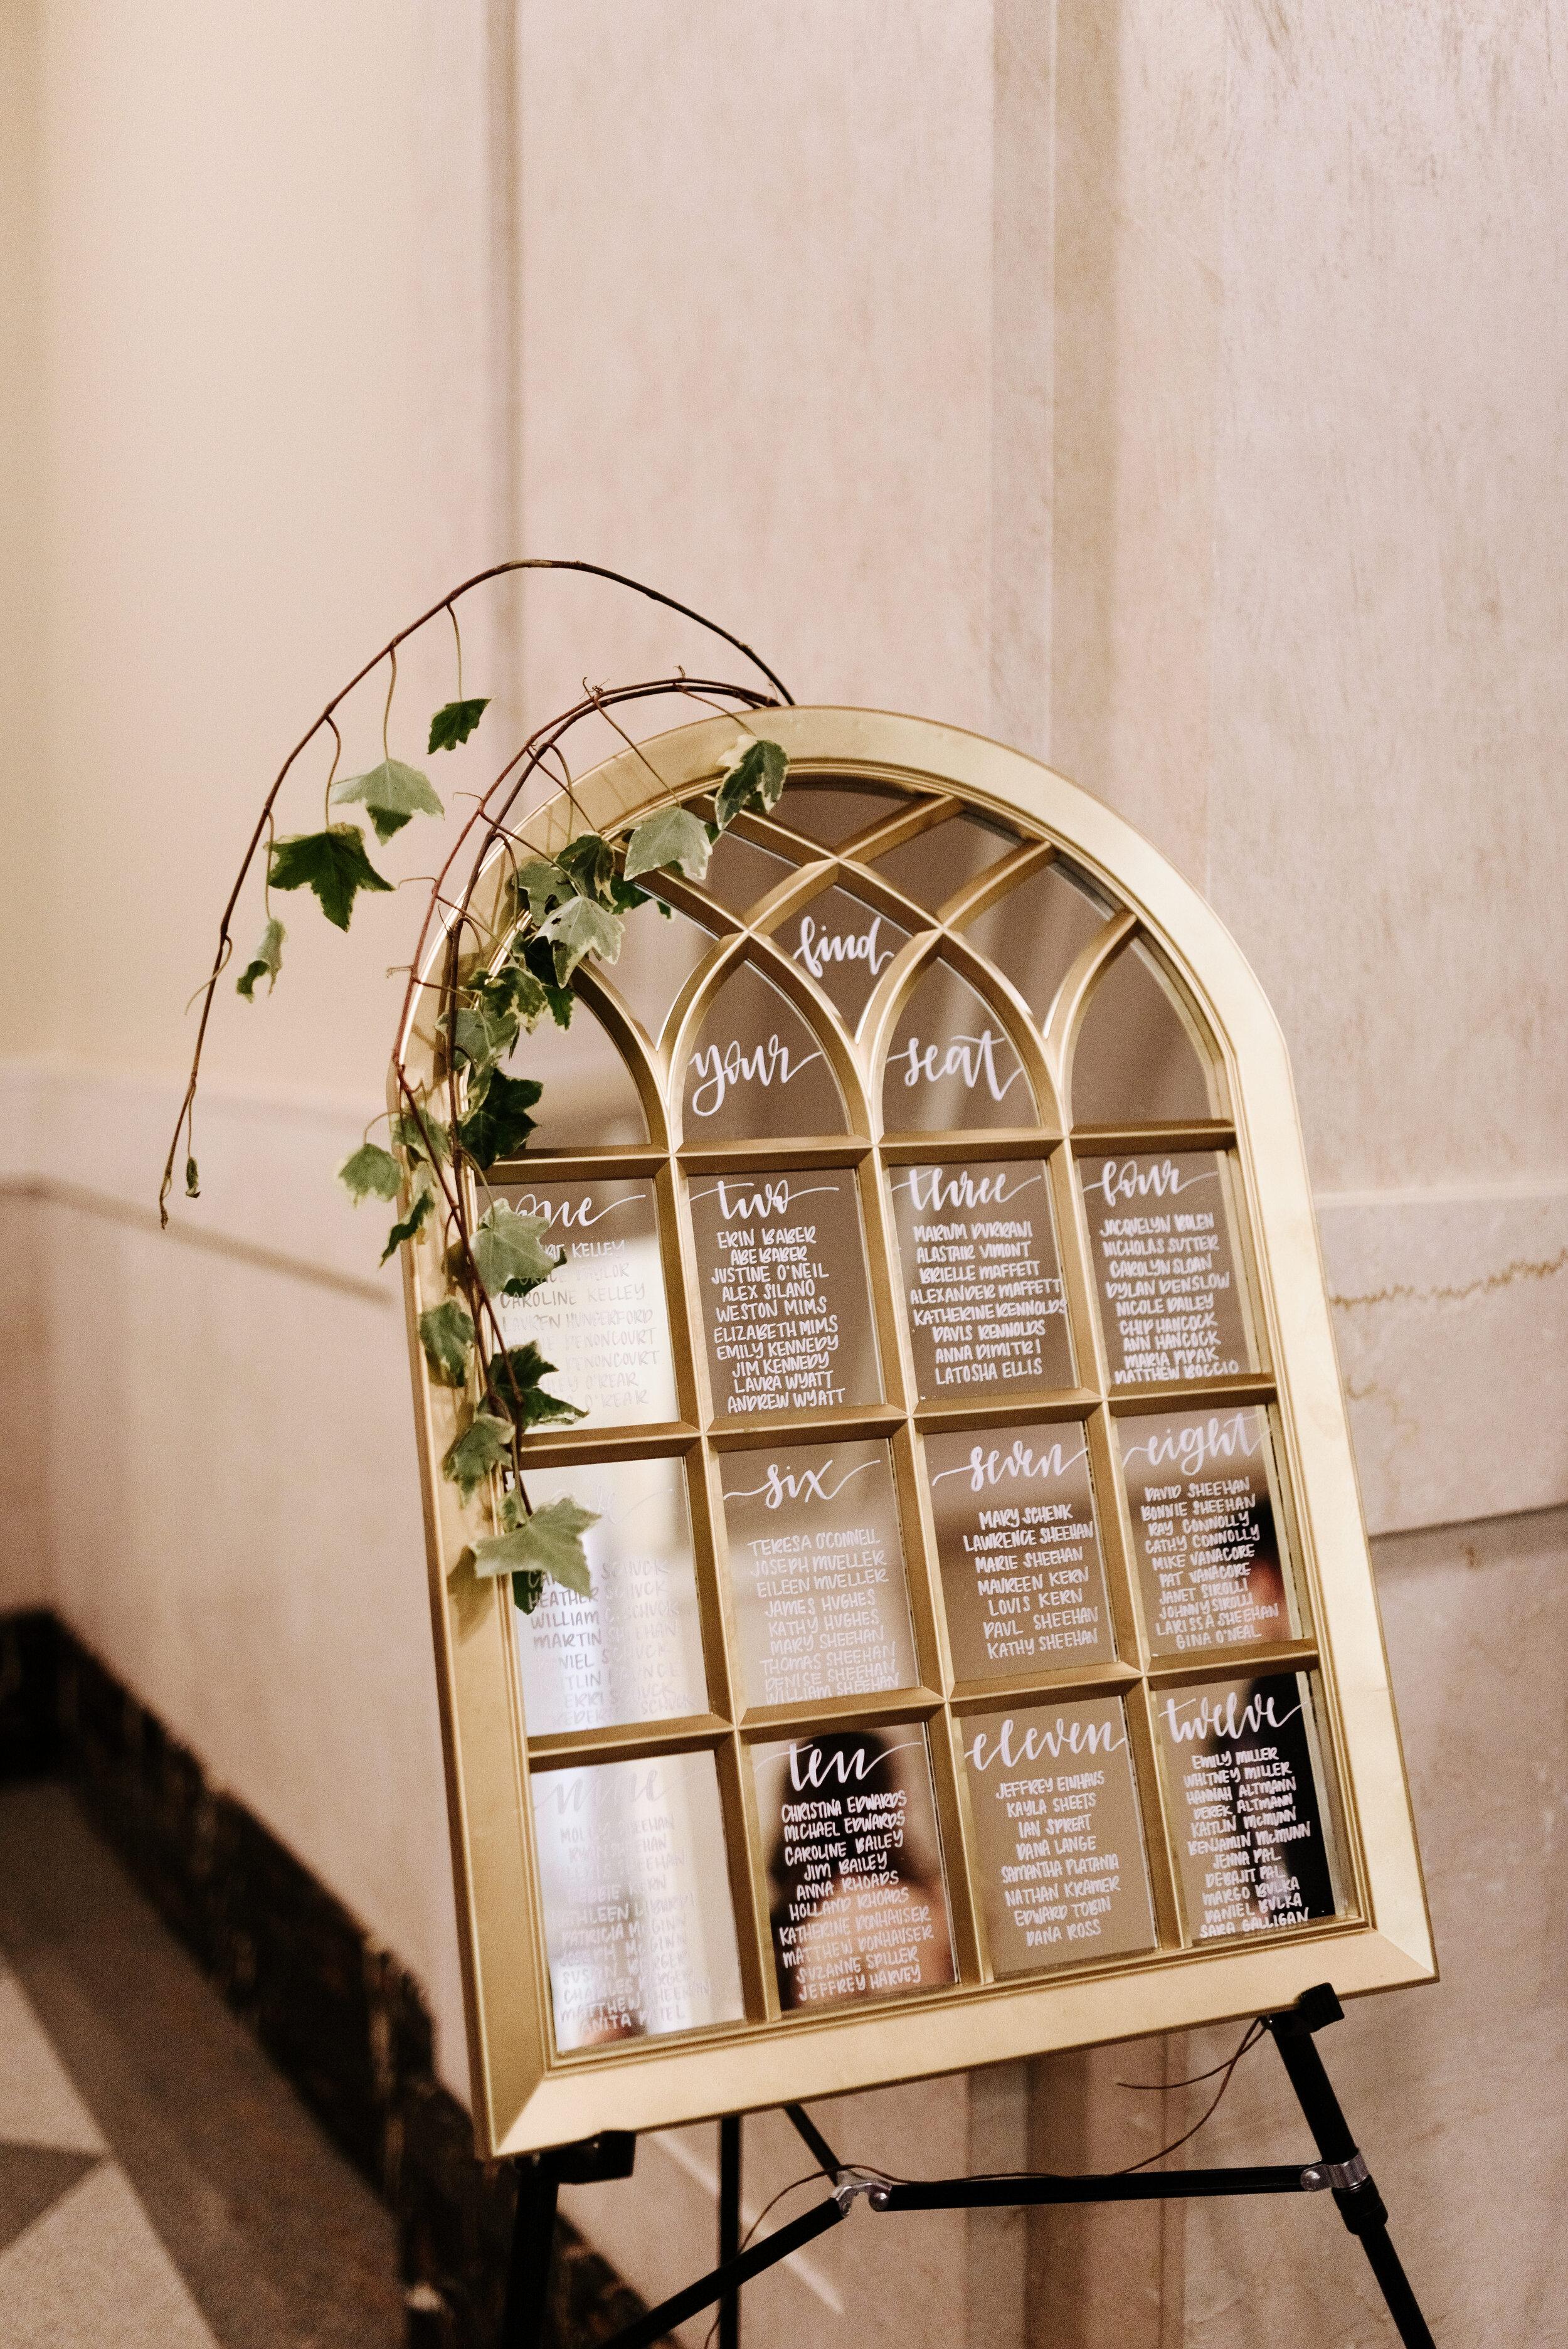 Cassie-Mrunal-Wedding-Quirk-Hotel-John-Marshall-Ballrooms-Richmond-Virginia-Photography-by-V-82.jpg